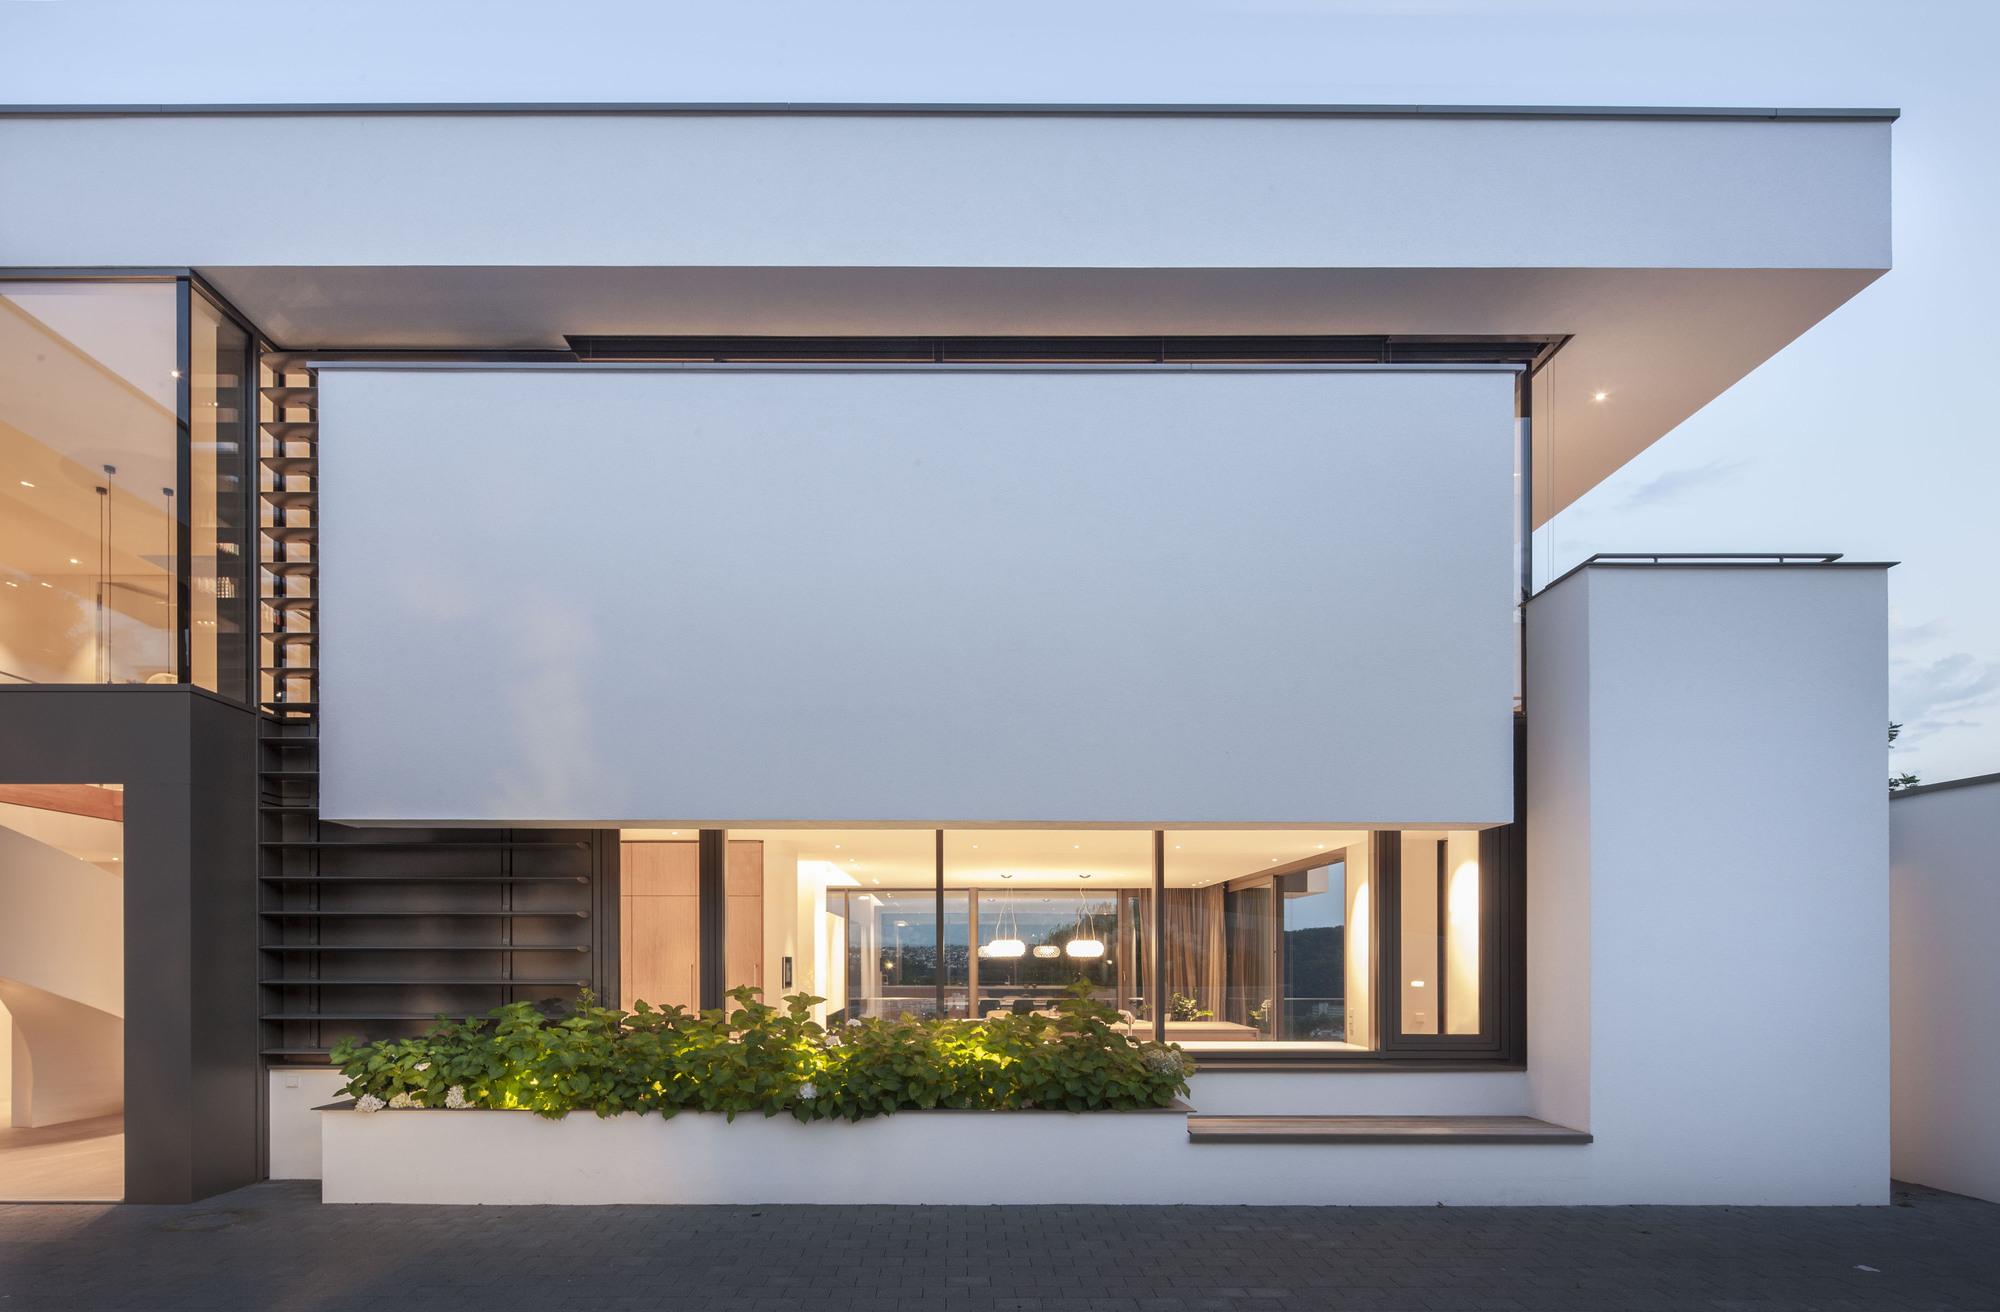 Gallery of house fmb fuchs wacker architekten 7 - Fmb architekten ...